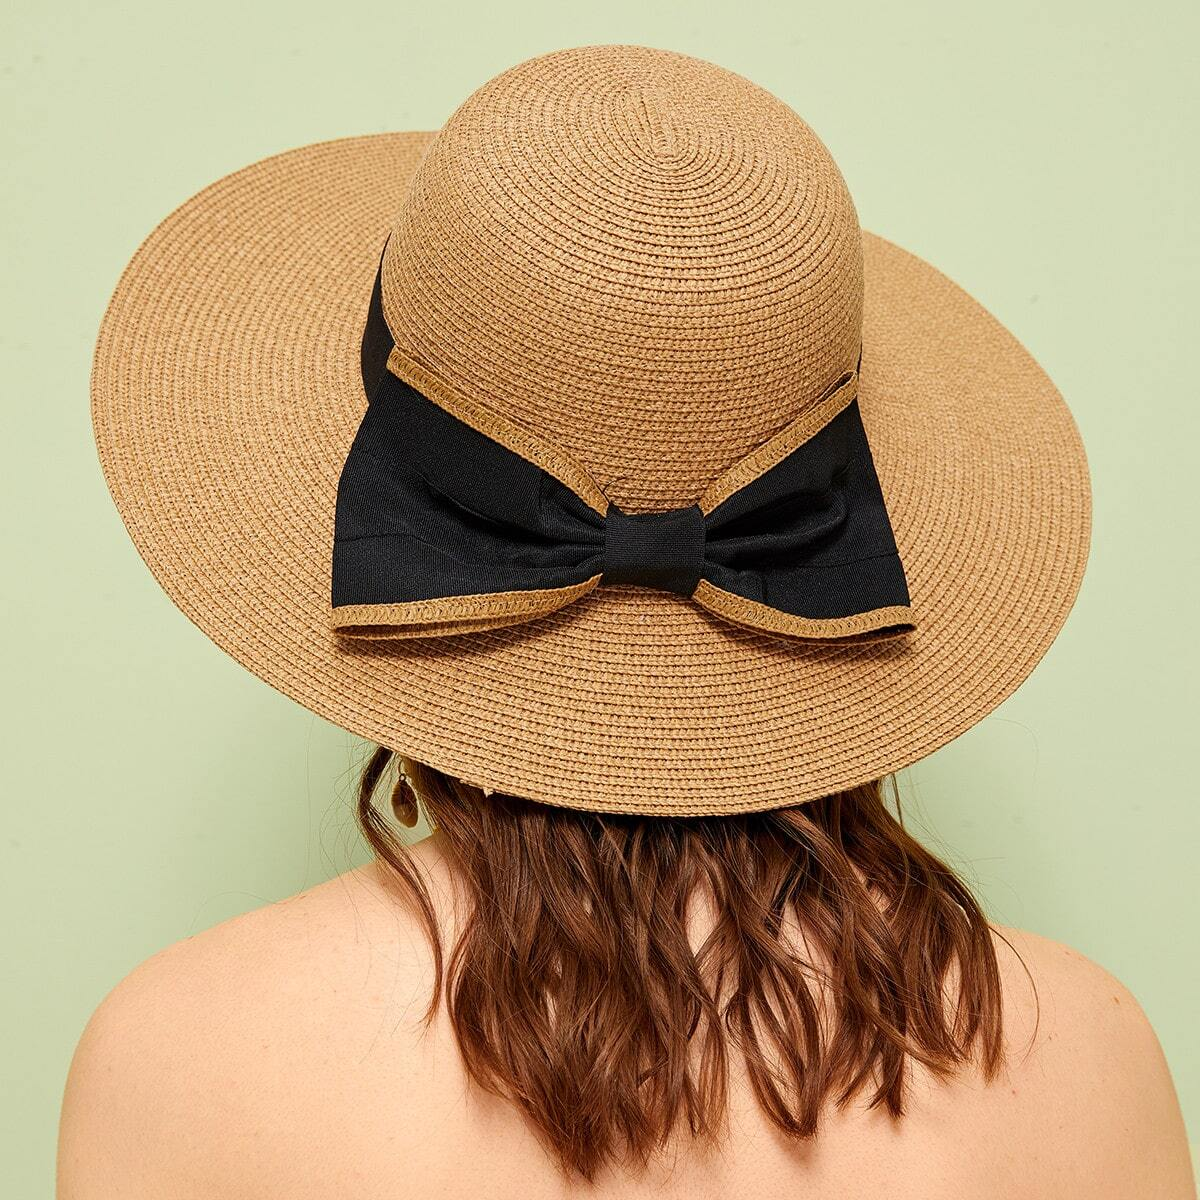 Шляпа С Широкими Полями И Бантом от SHEIN